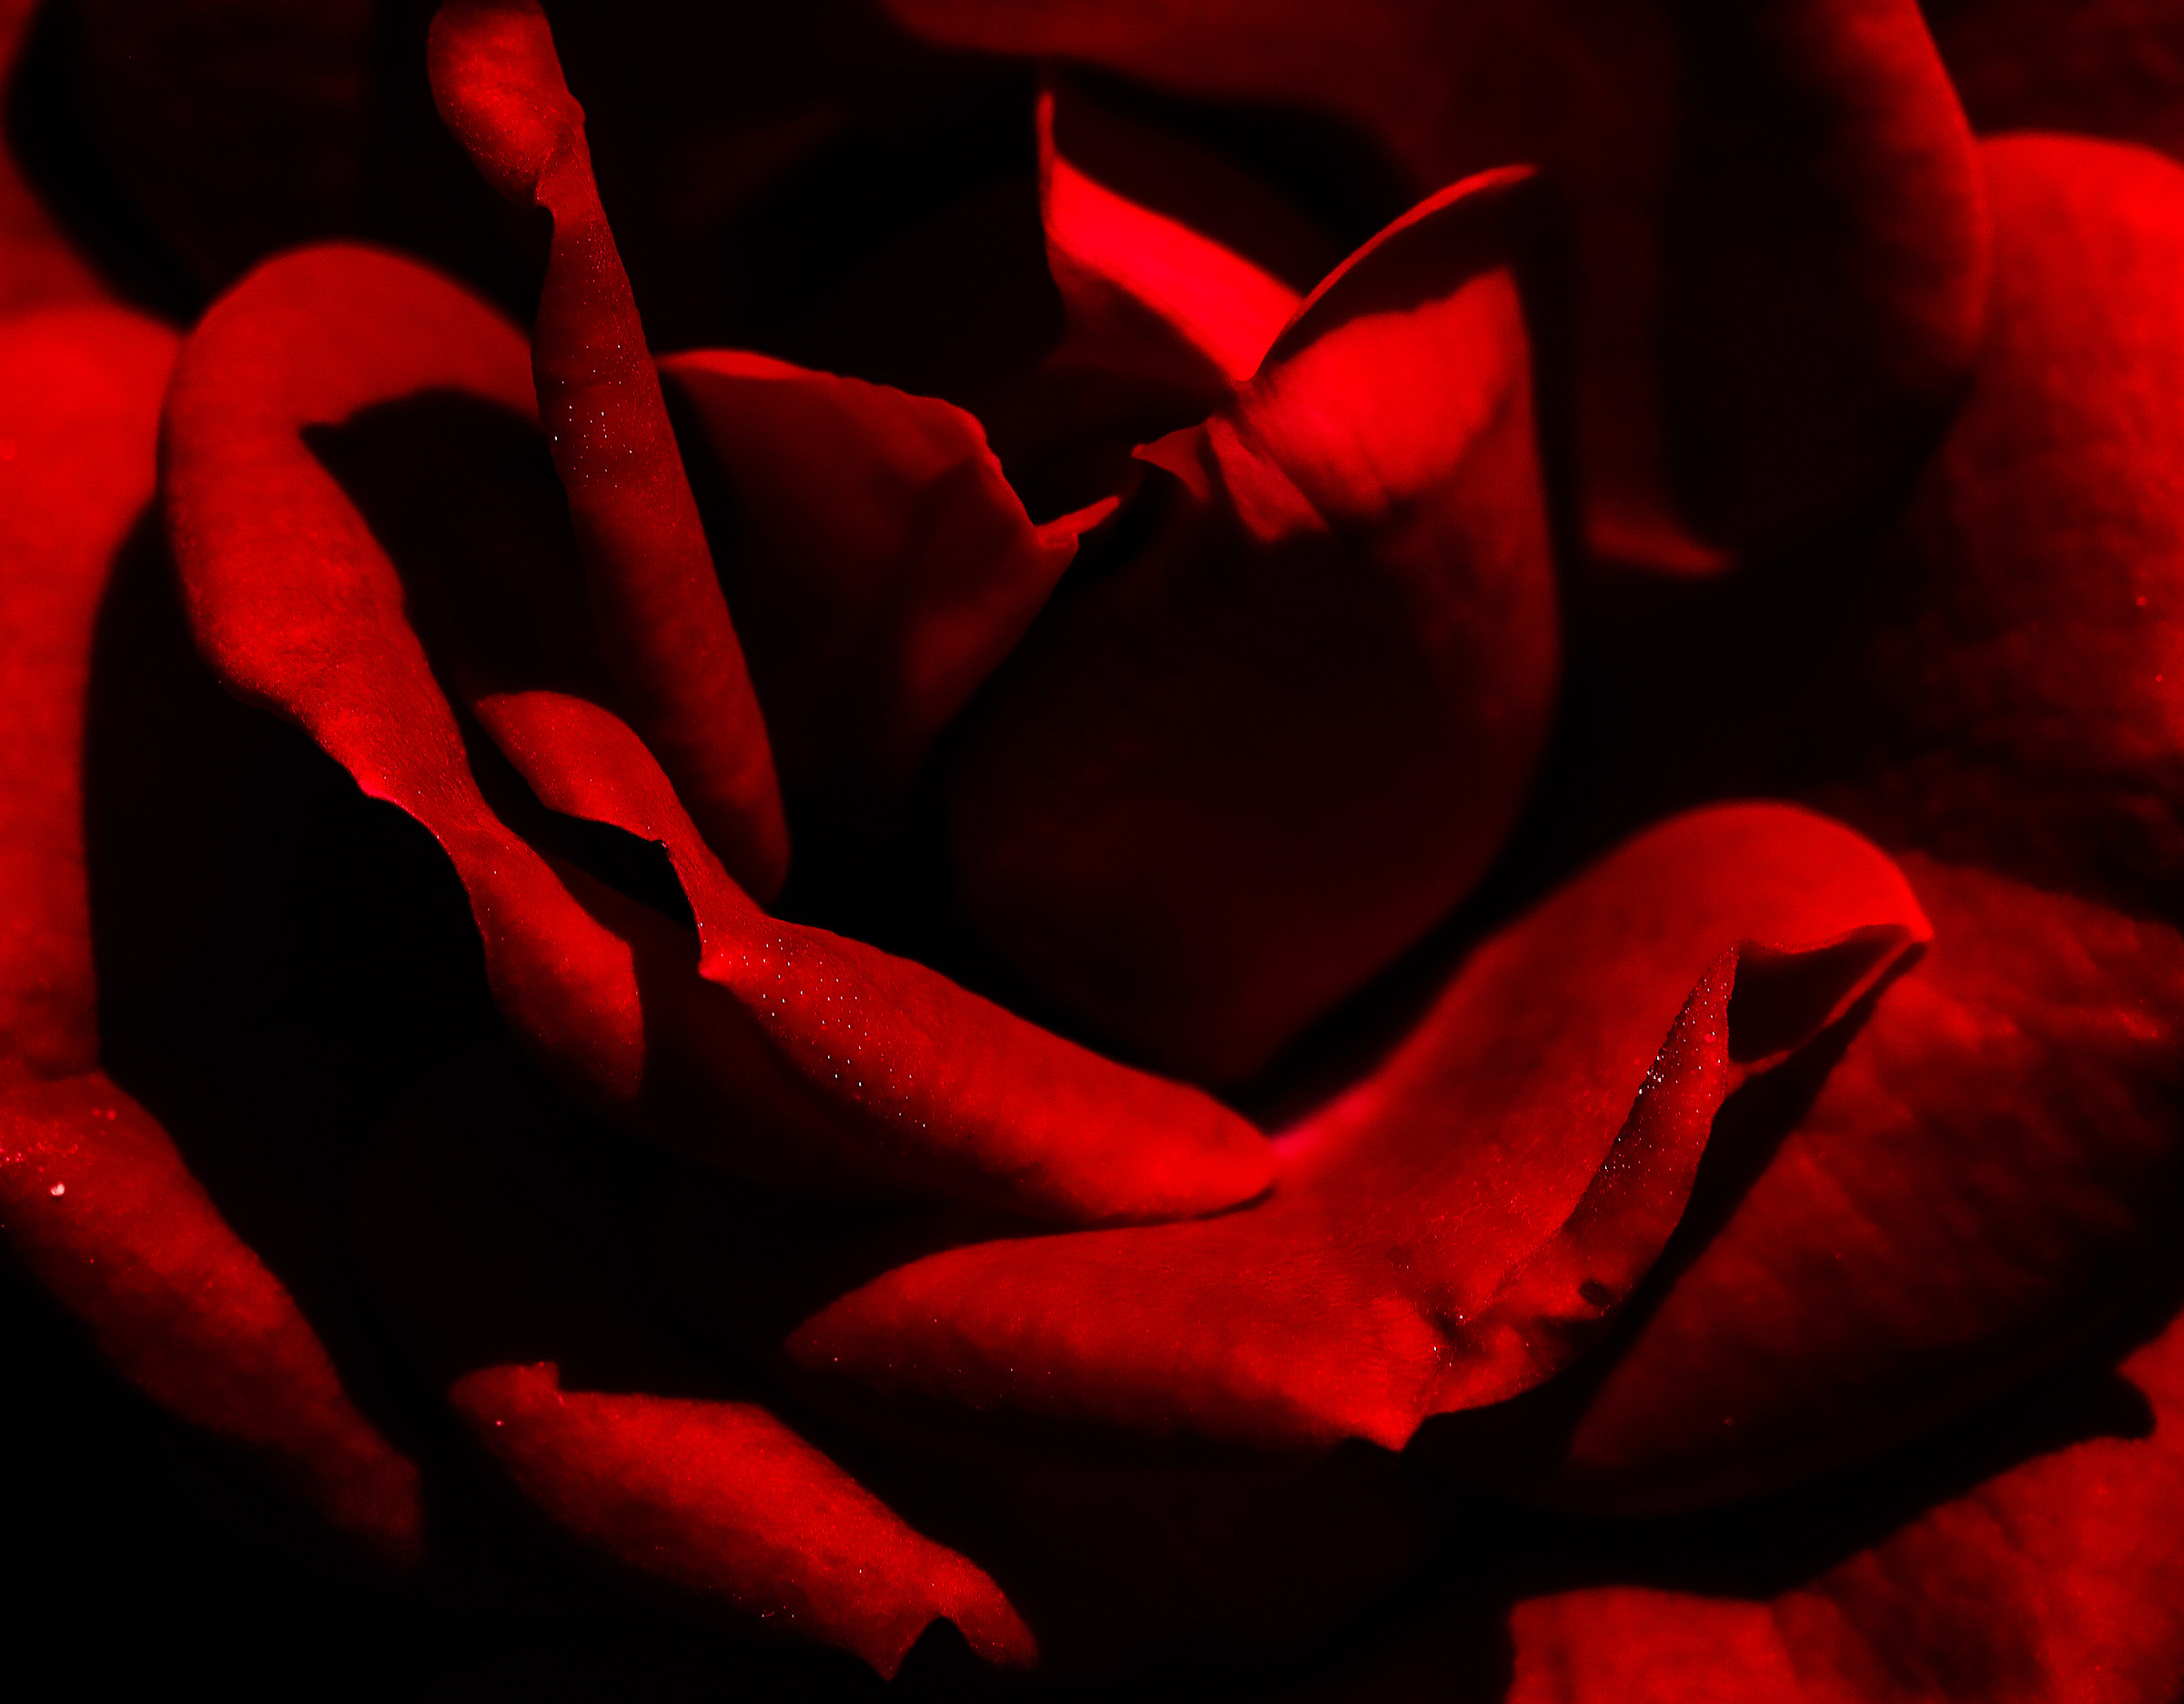 Prfondo red..........